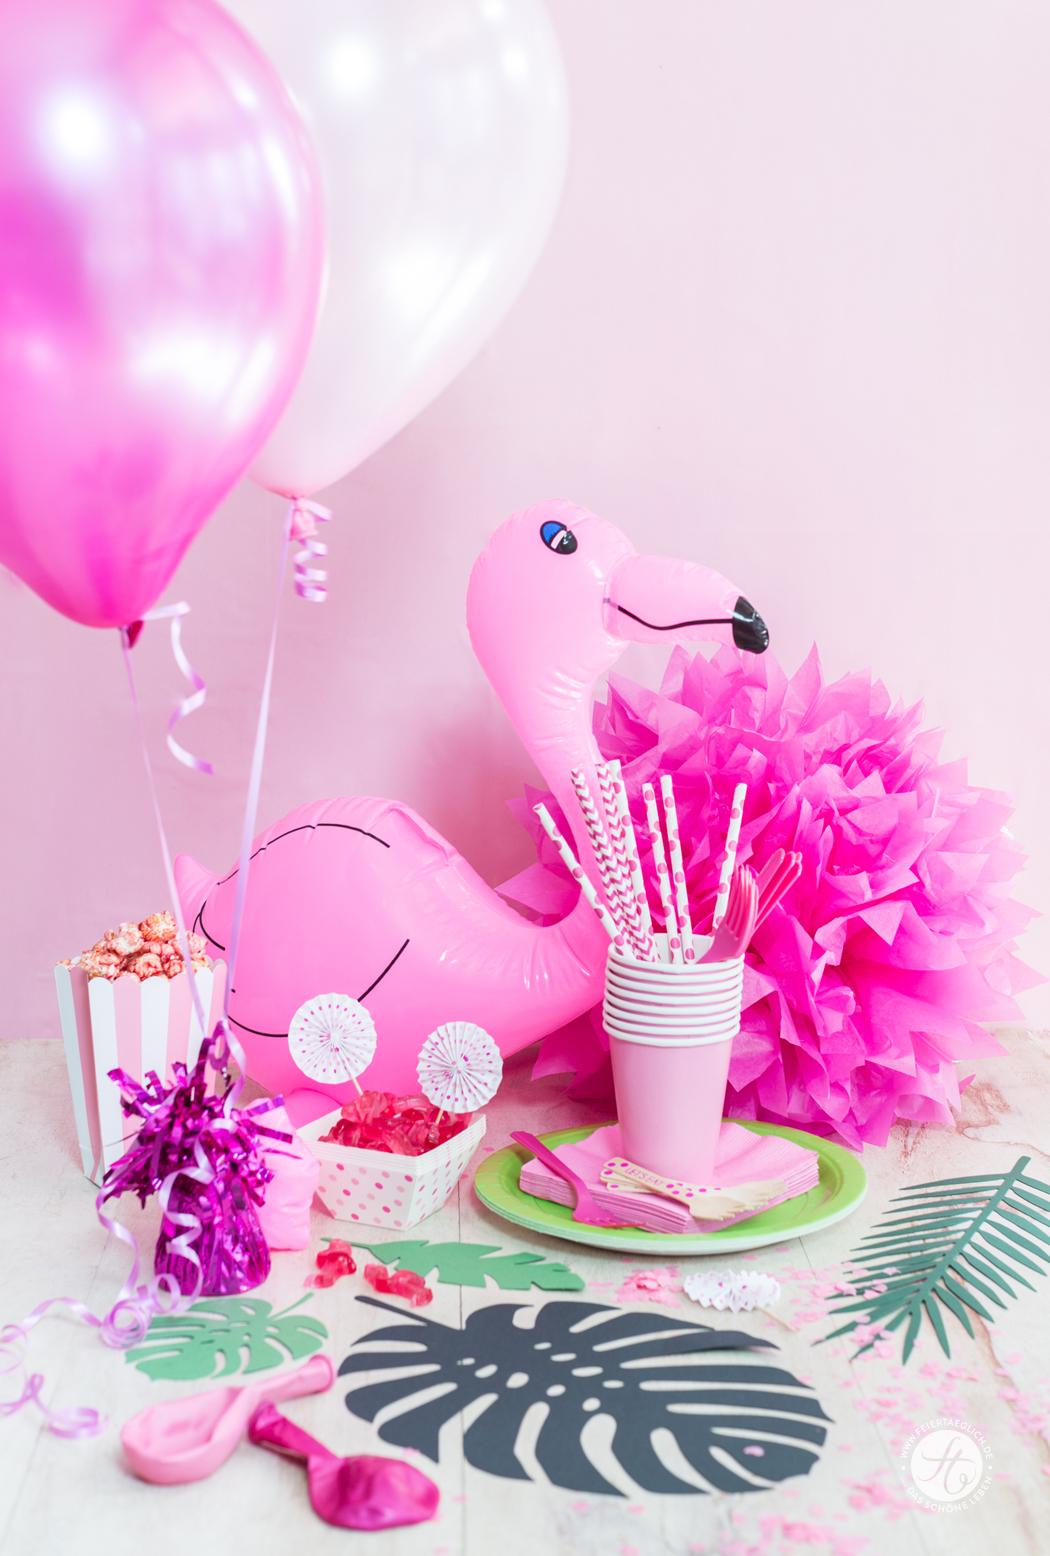 Partydecorations Amscan, Gewinnpaket, feiertäglich HappyMottoparty Flamingo